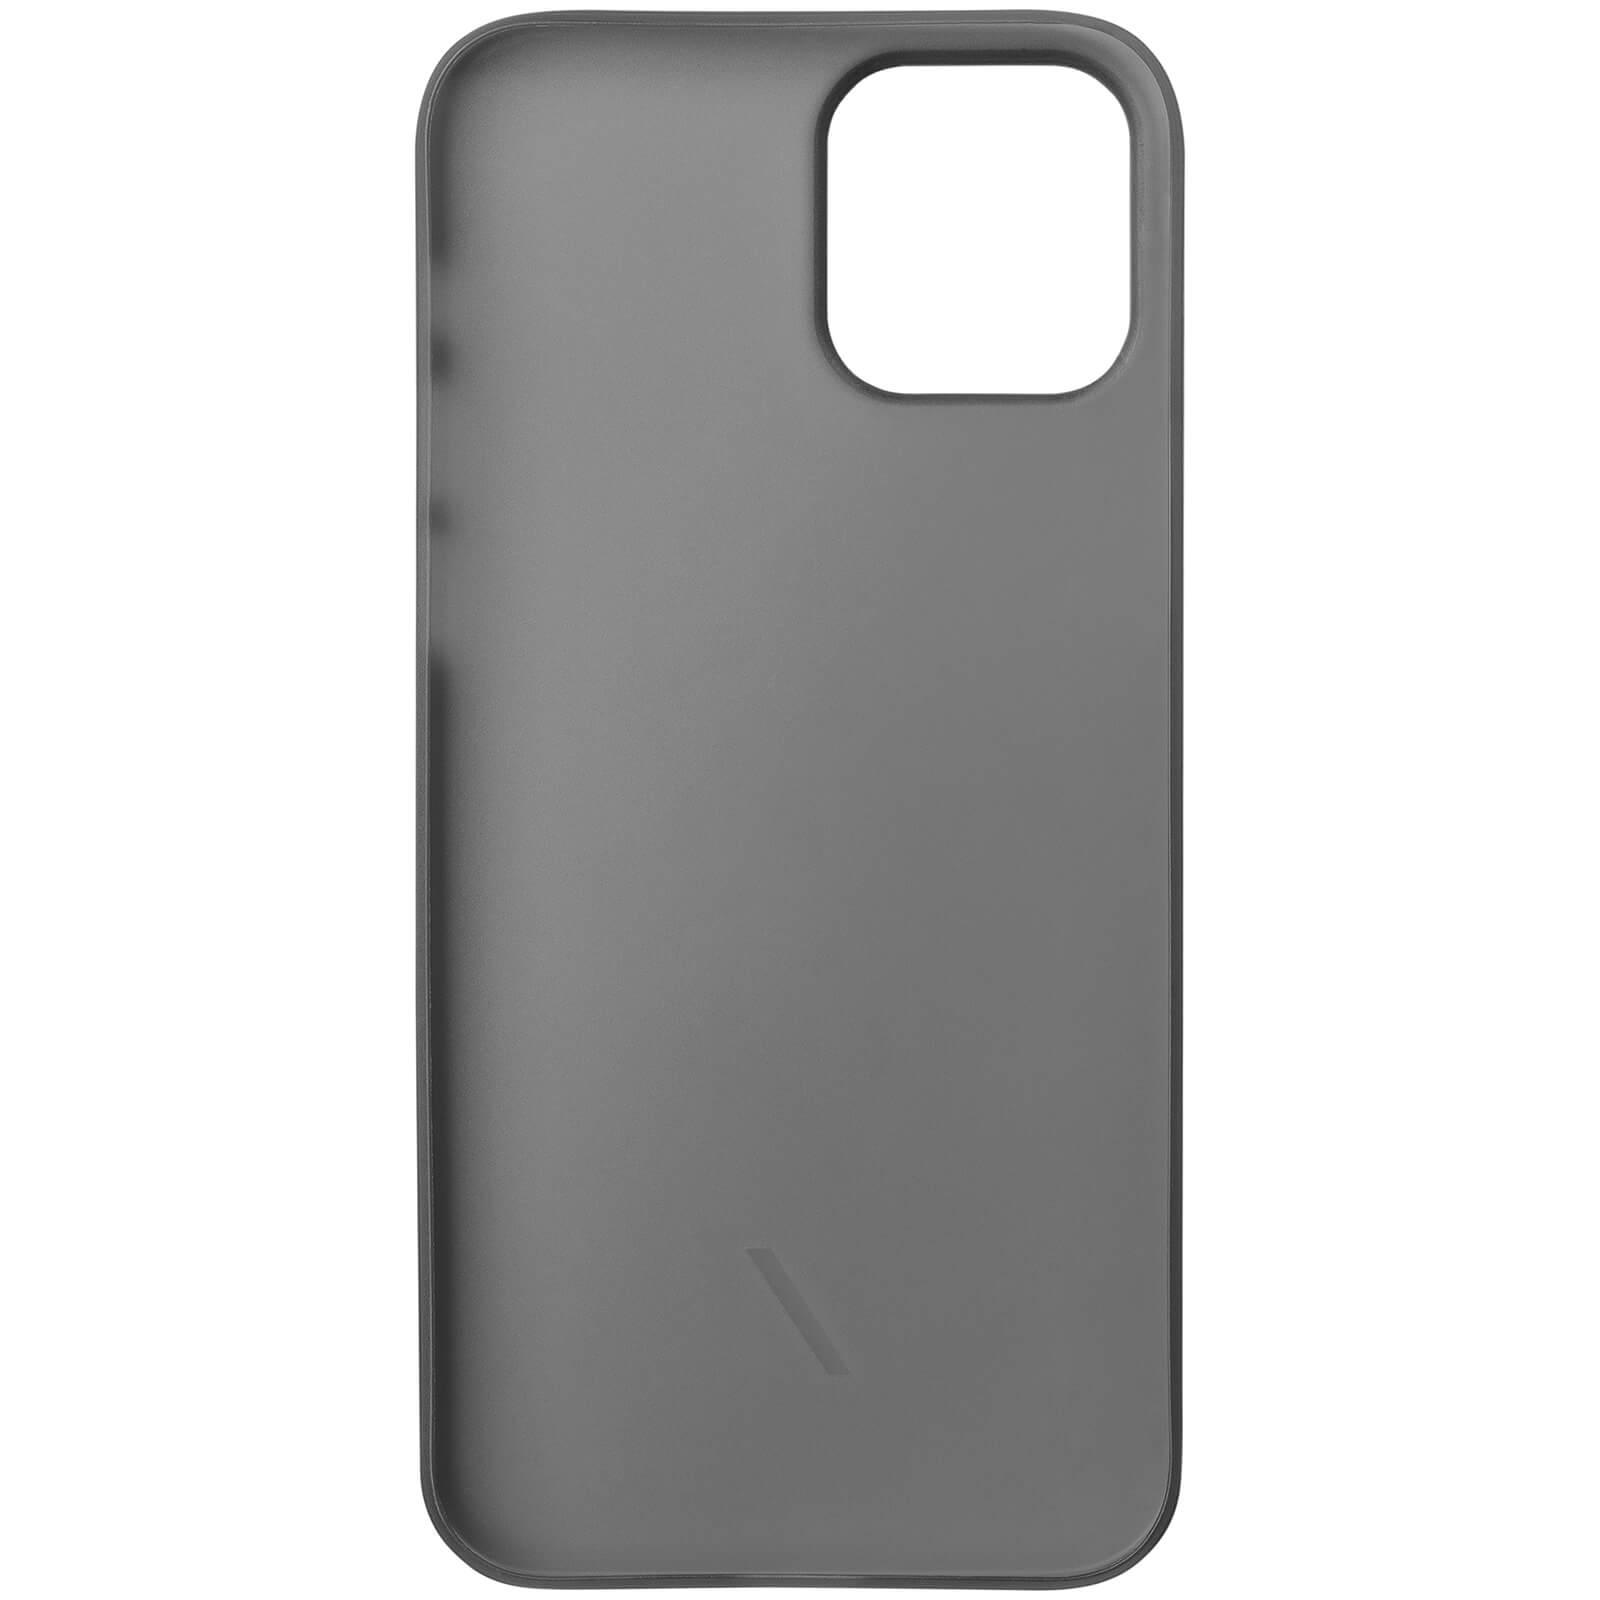 Native Union Clic Air Anti-Bacterial iPhone Case - Smoke - 12 Mini